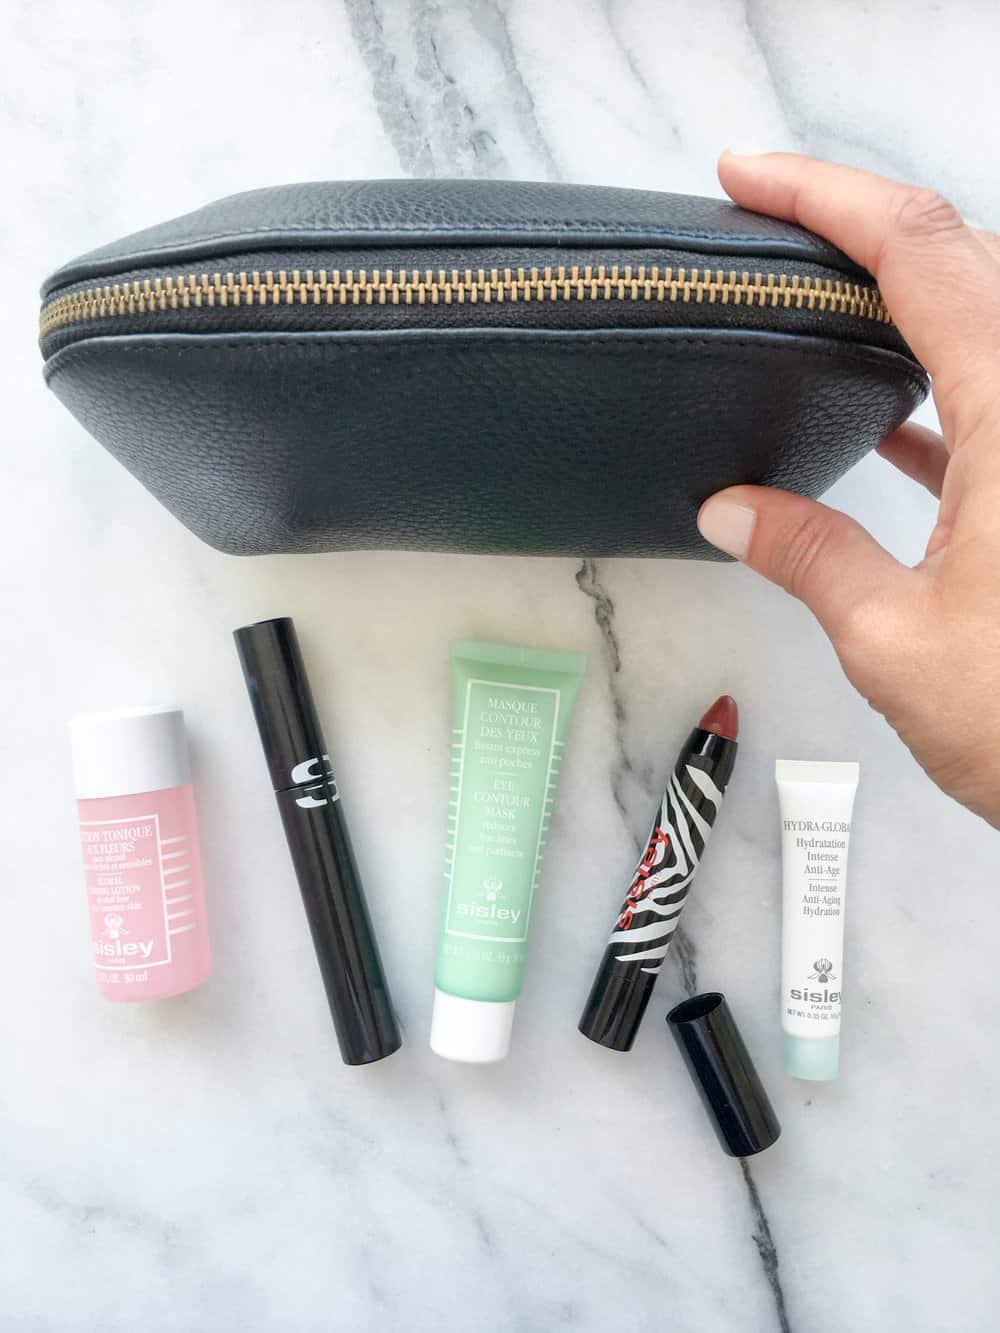 Sisley-Paris travel beauty products